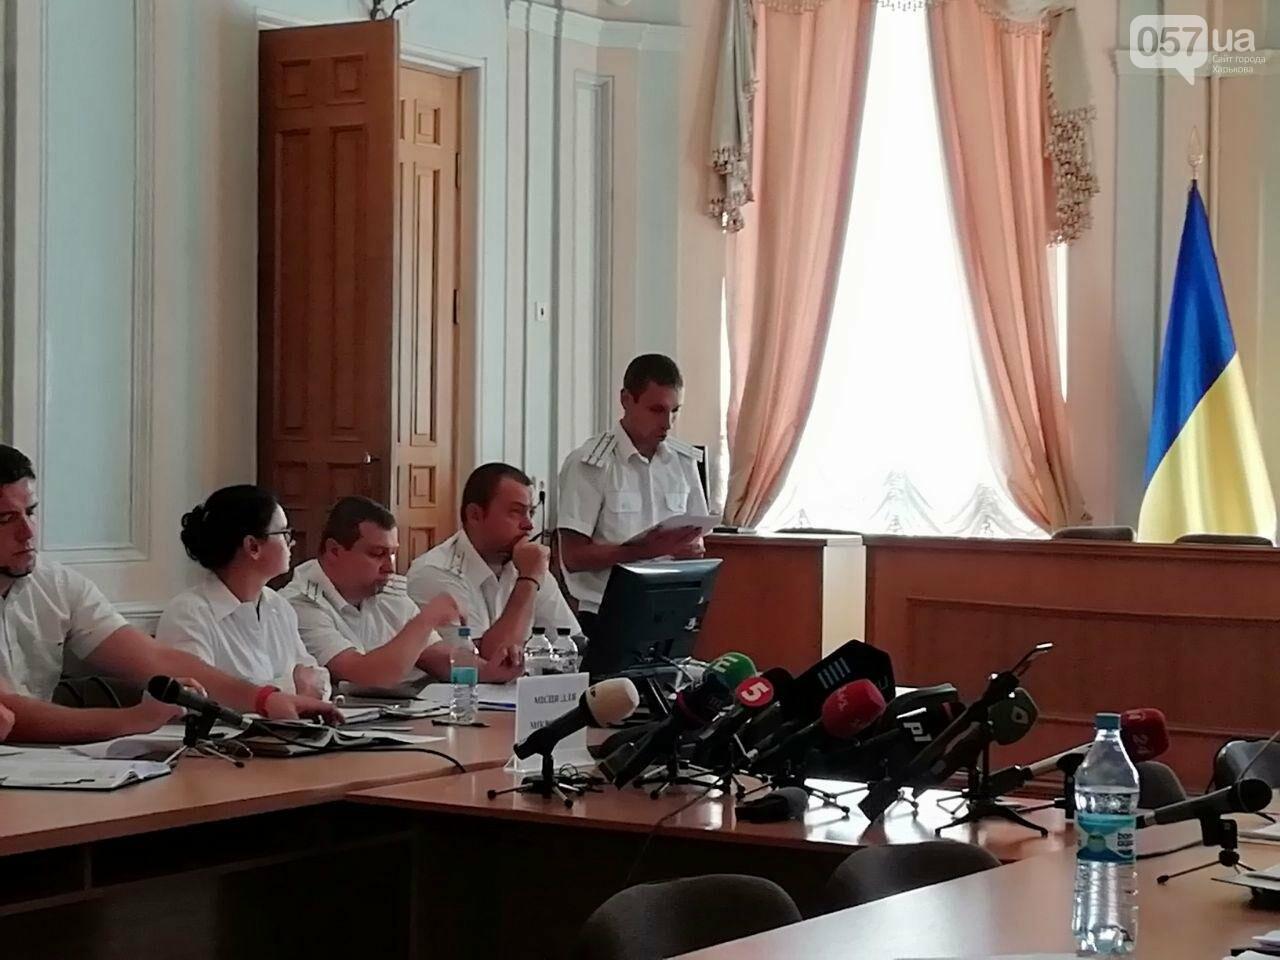 Апелляция по делу ДТП на Сумской: суд оставил приговор без изменений, - ОНЛАЙН-ТРАНСЛЯЦИЯ, фото-2